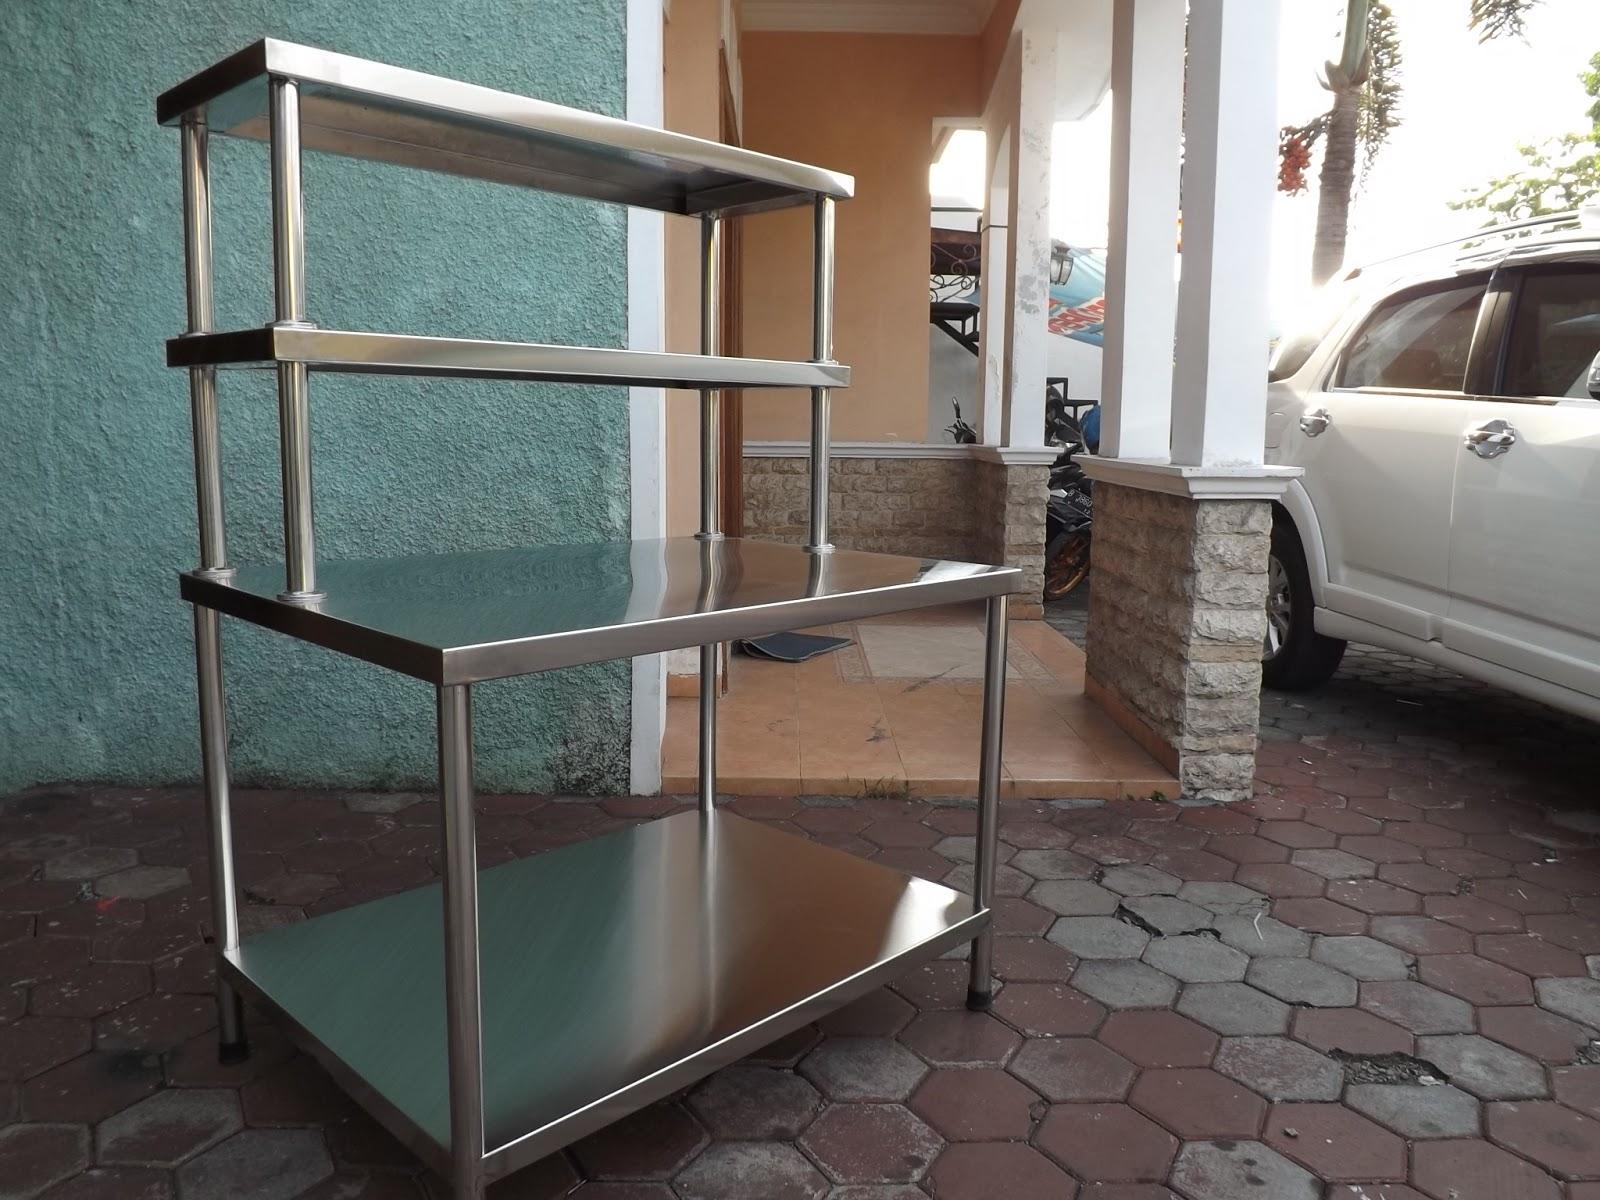 Meja Stainless Steel Untuk Dapur Resto Hotel Dll Oven